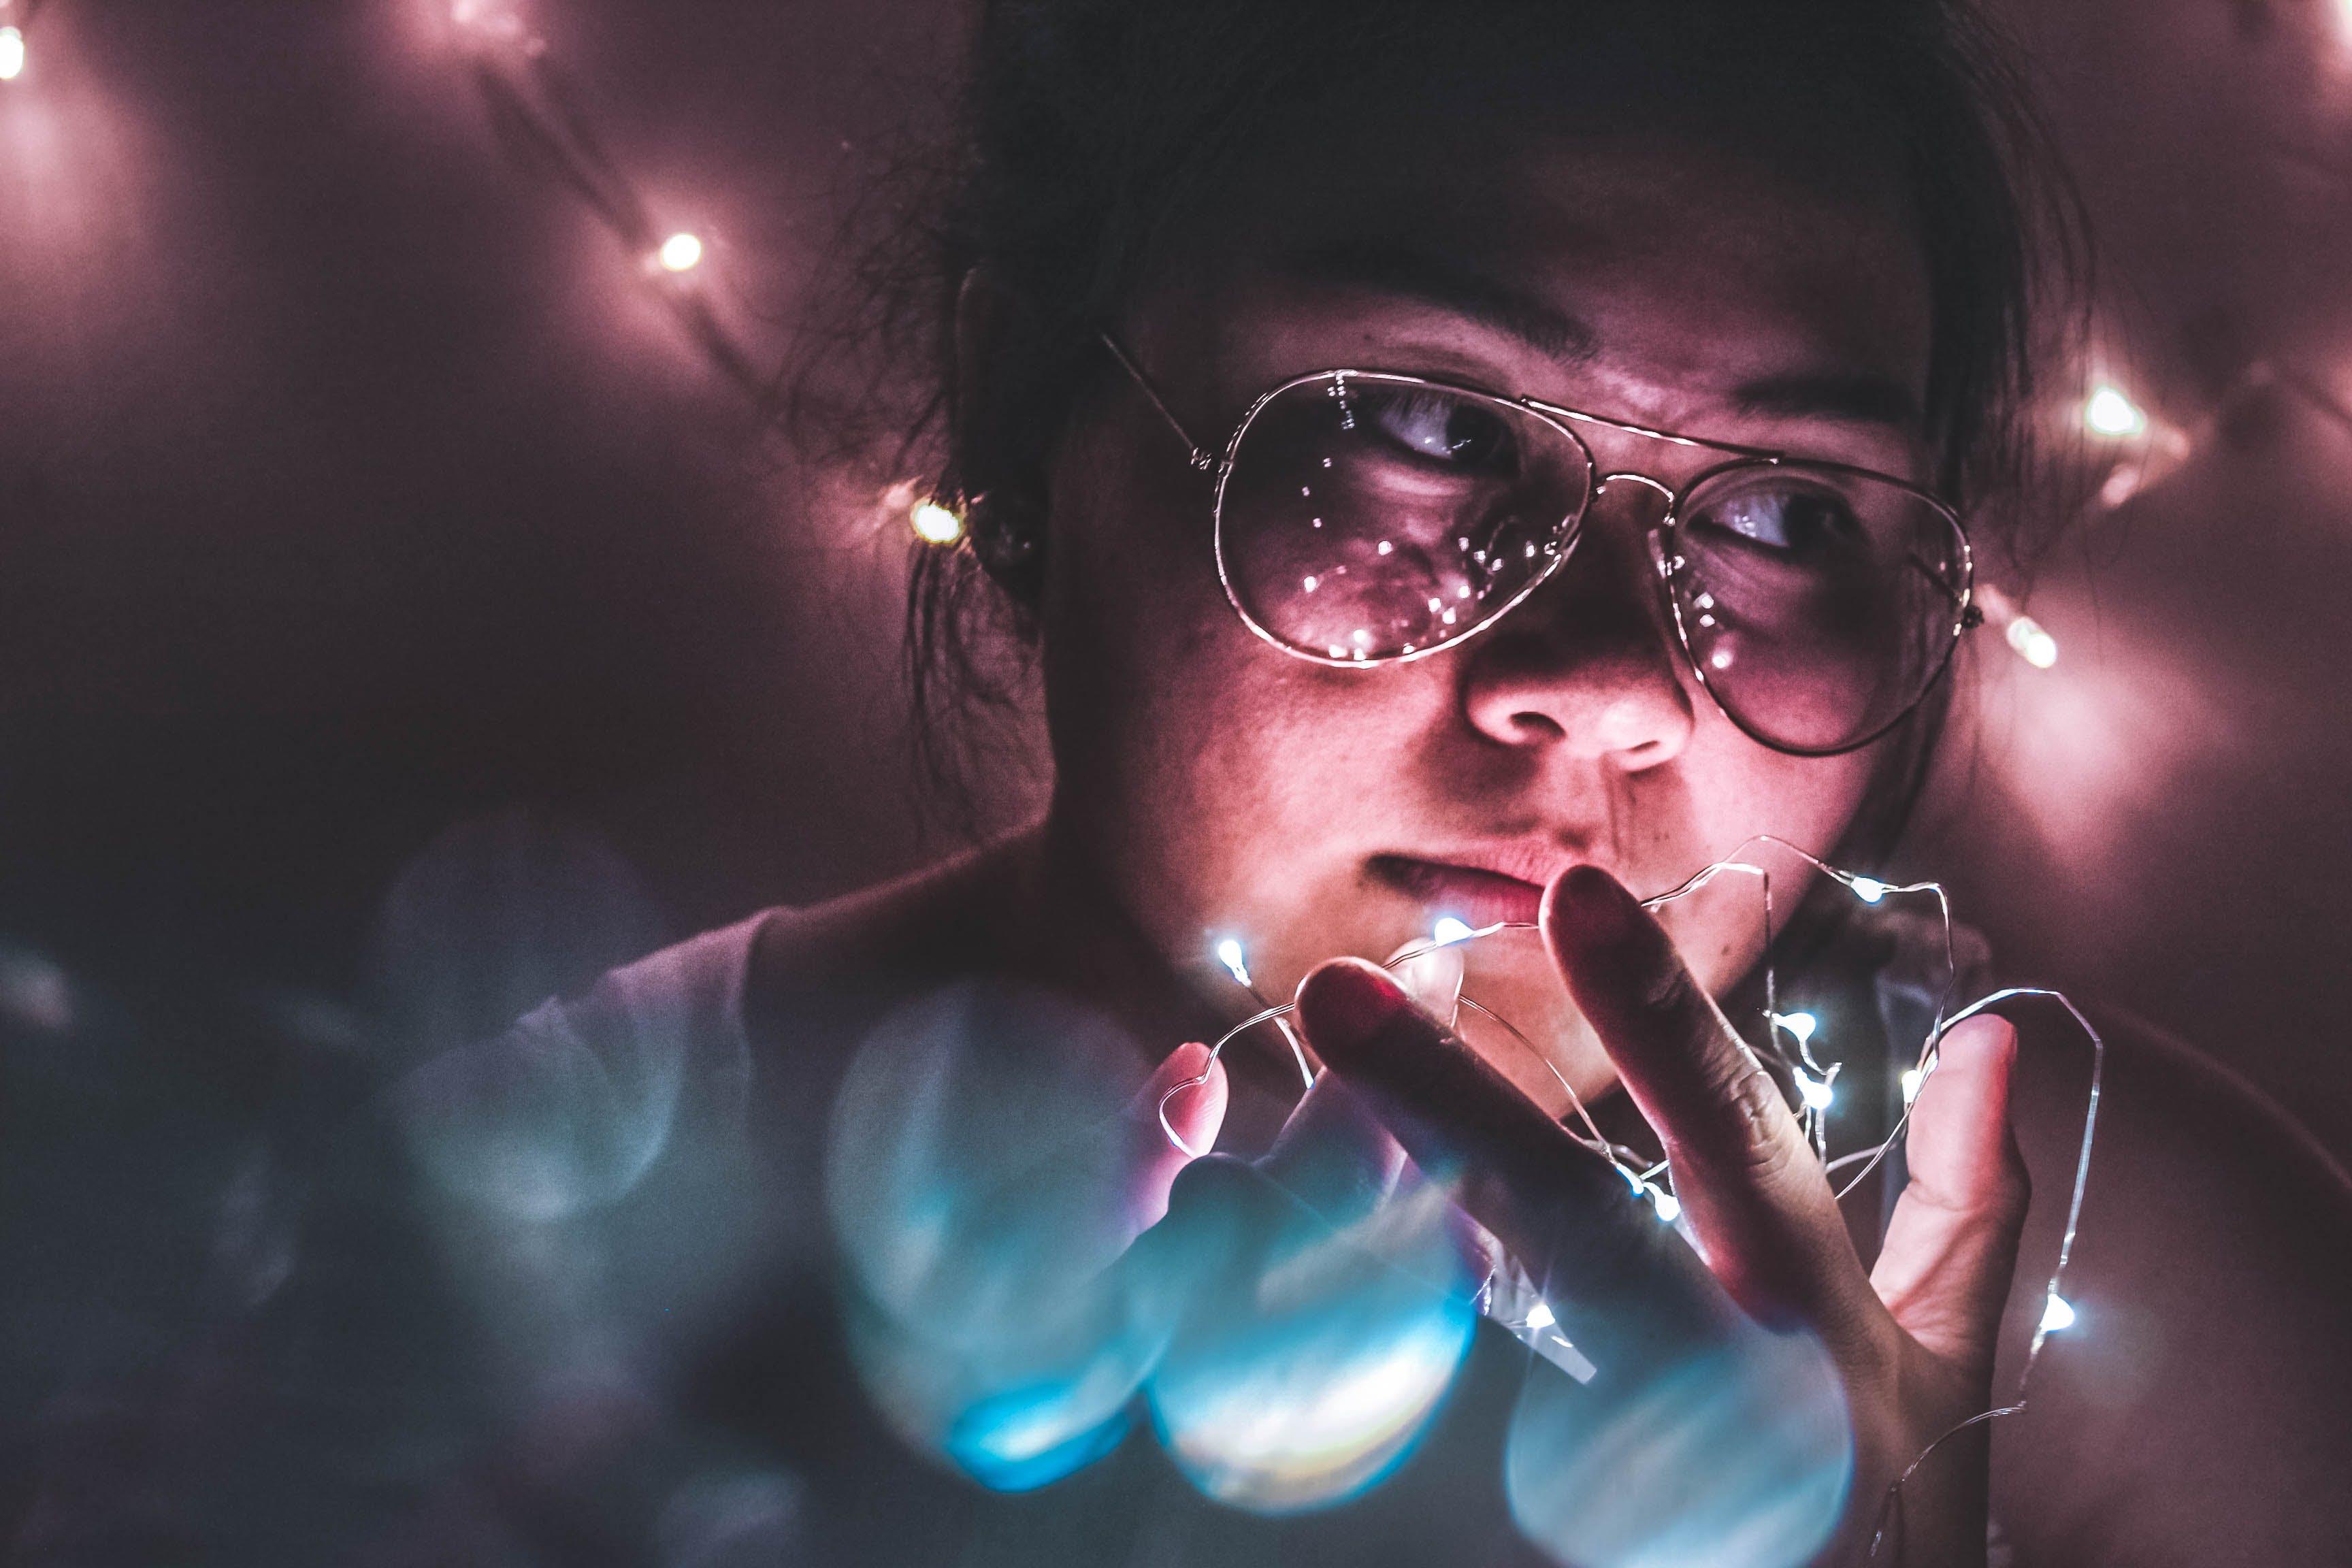 Free stock photo of person, woman, lights, fun